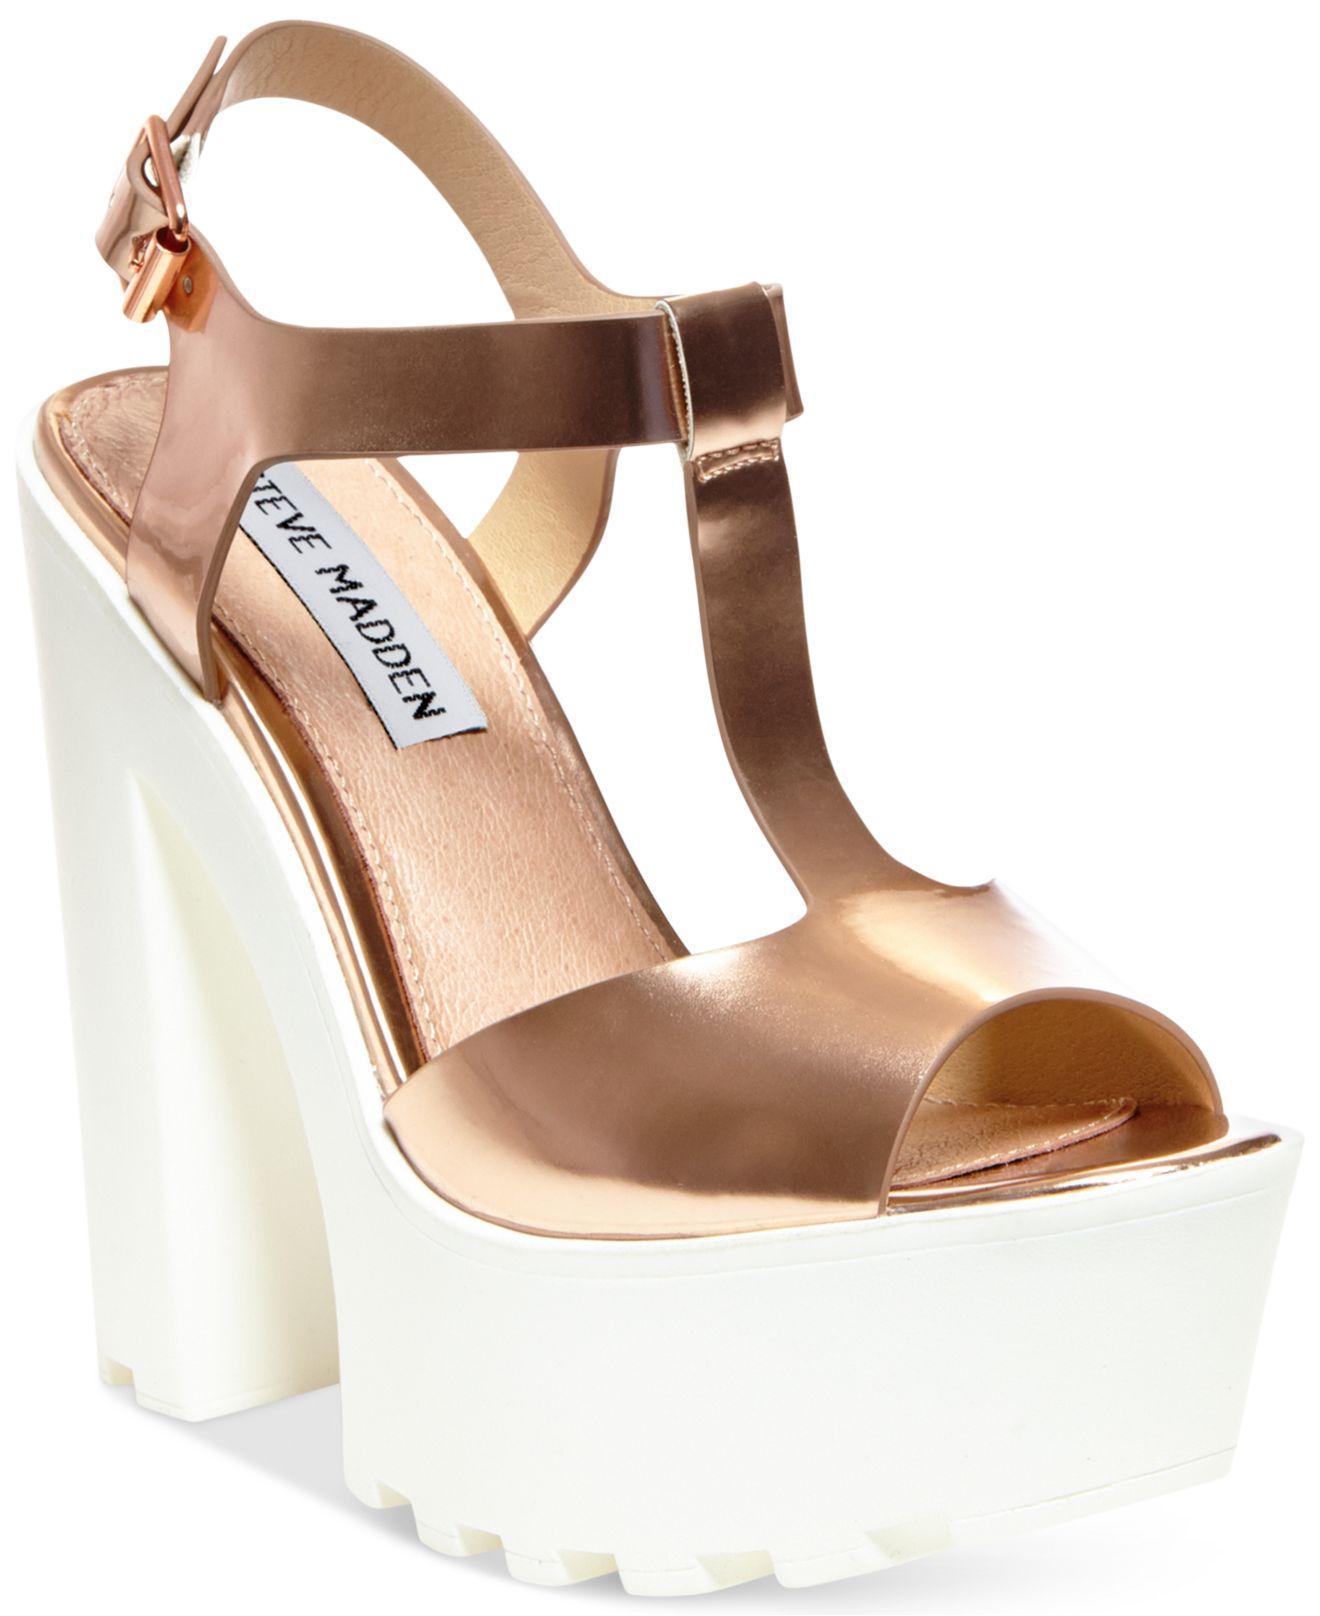 22a08c22b0c Lyst - Steve Madden Girltalk Platform Wedge Sandals in Pink